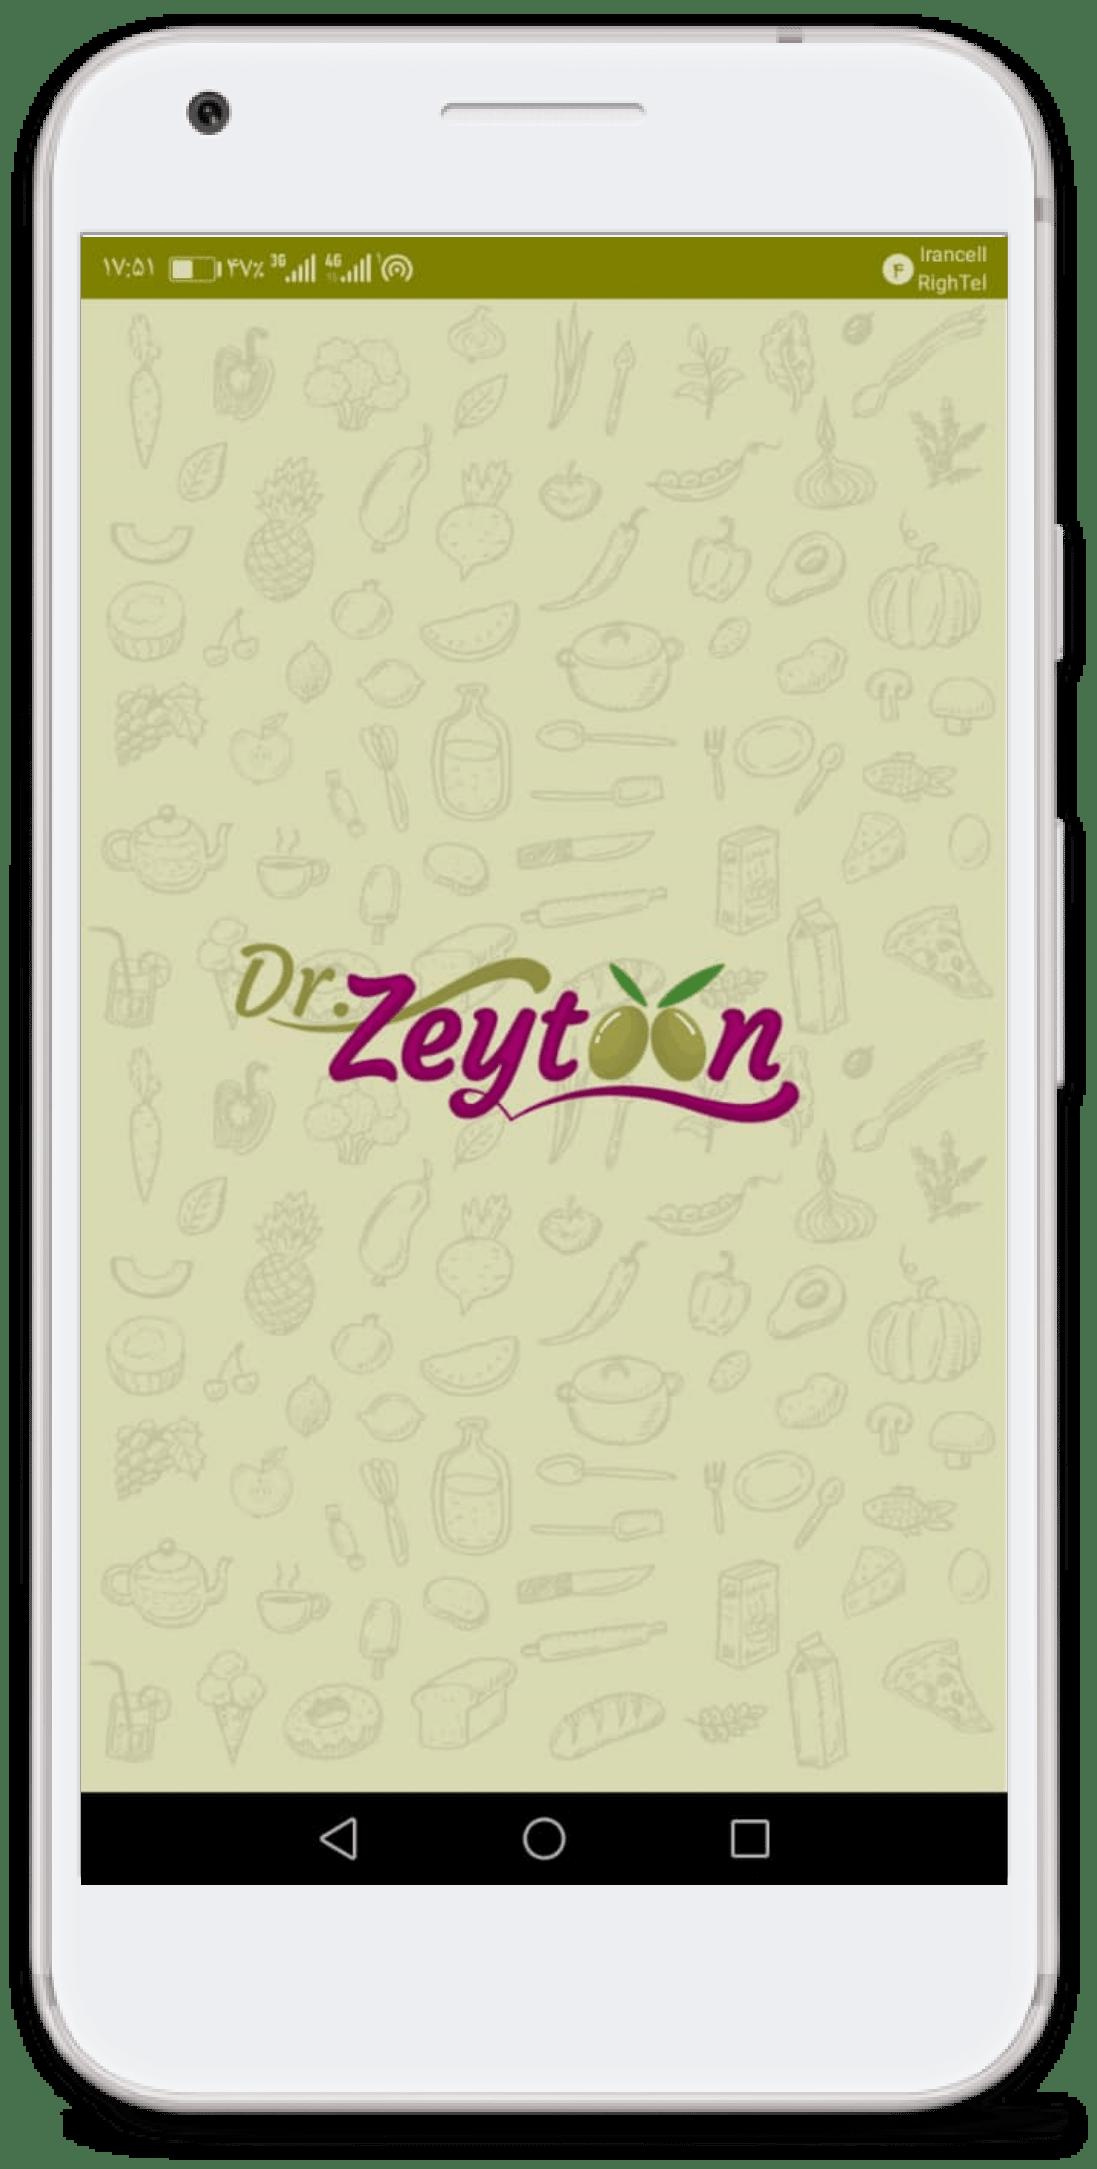 اپلیکیشن دکتر زیتون